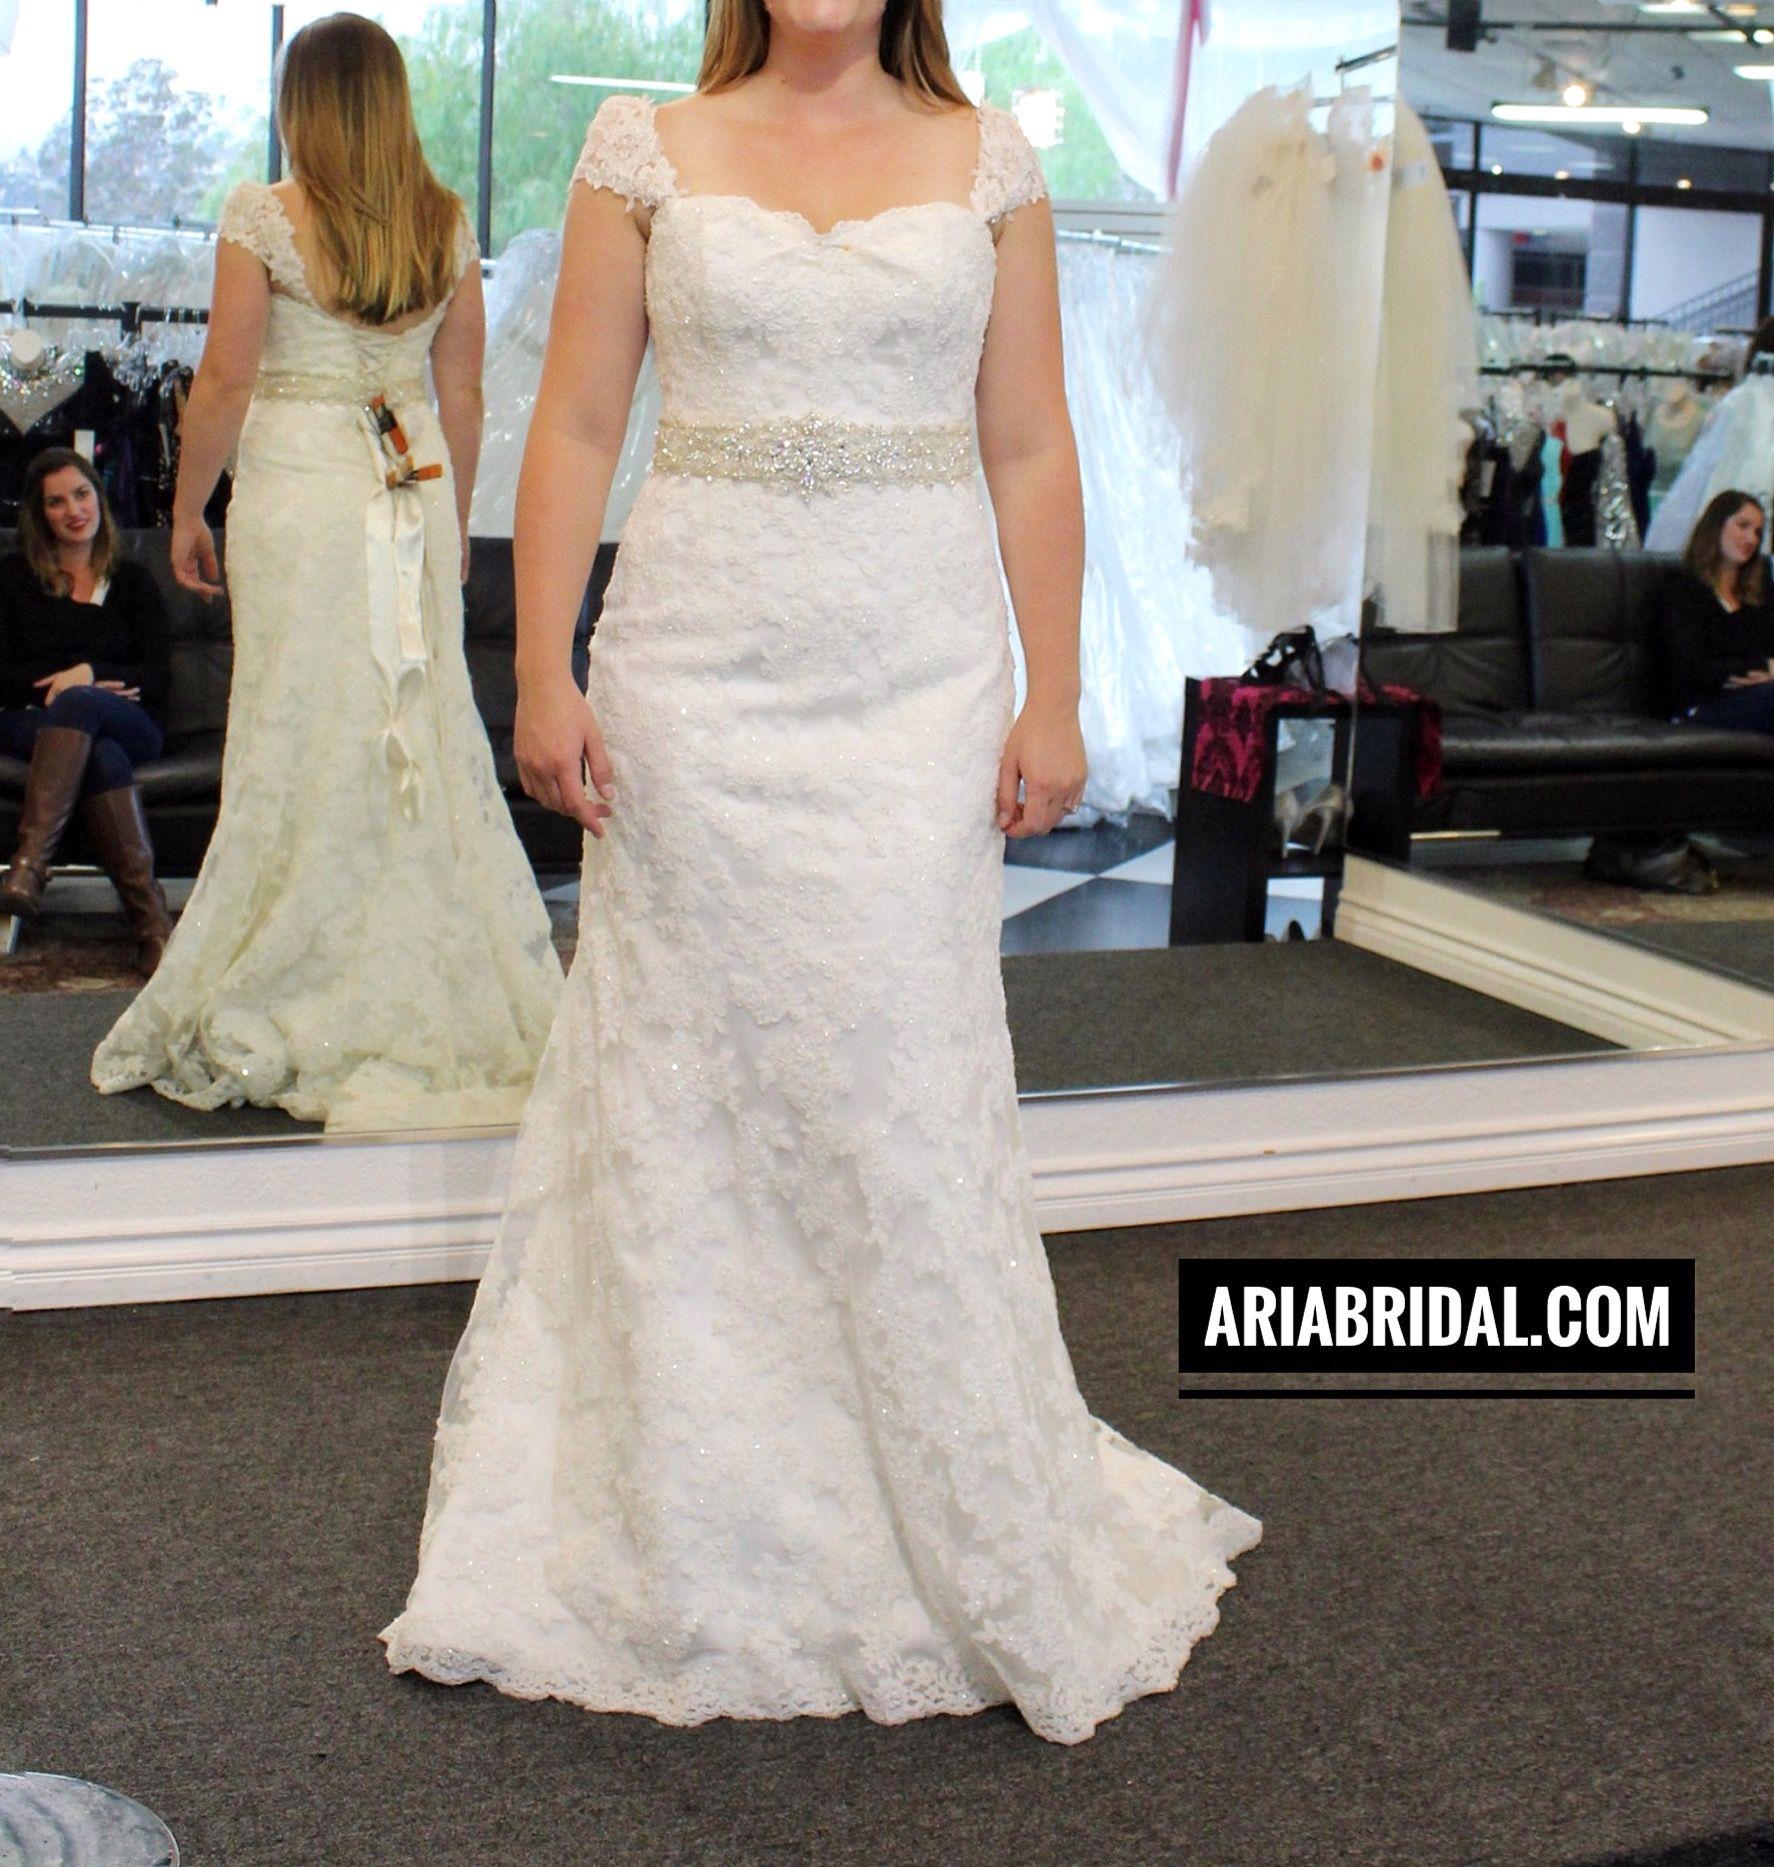 Wedding Dress at Aria Bridal in Escondido/ San Diego, California ...